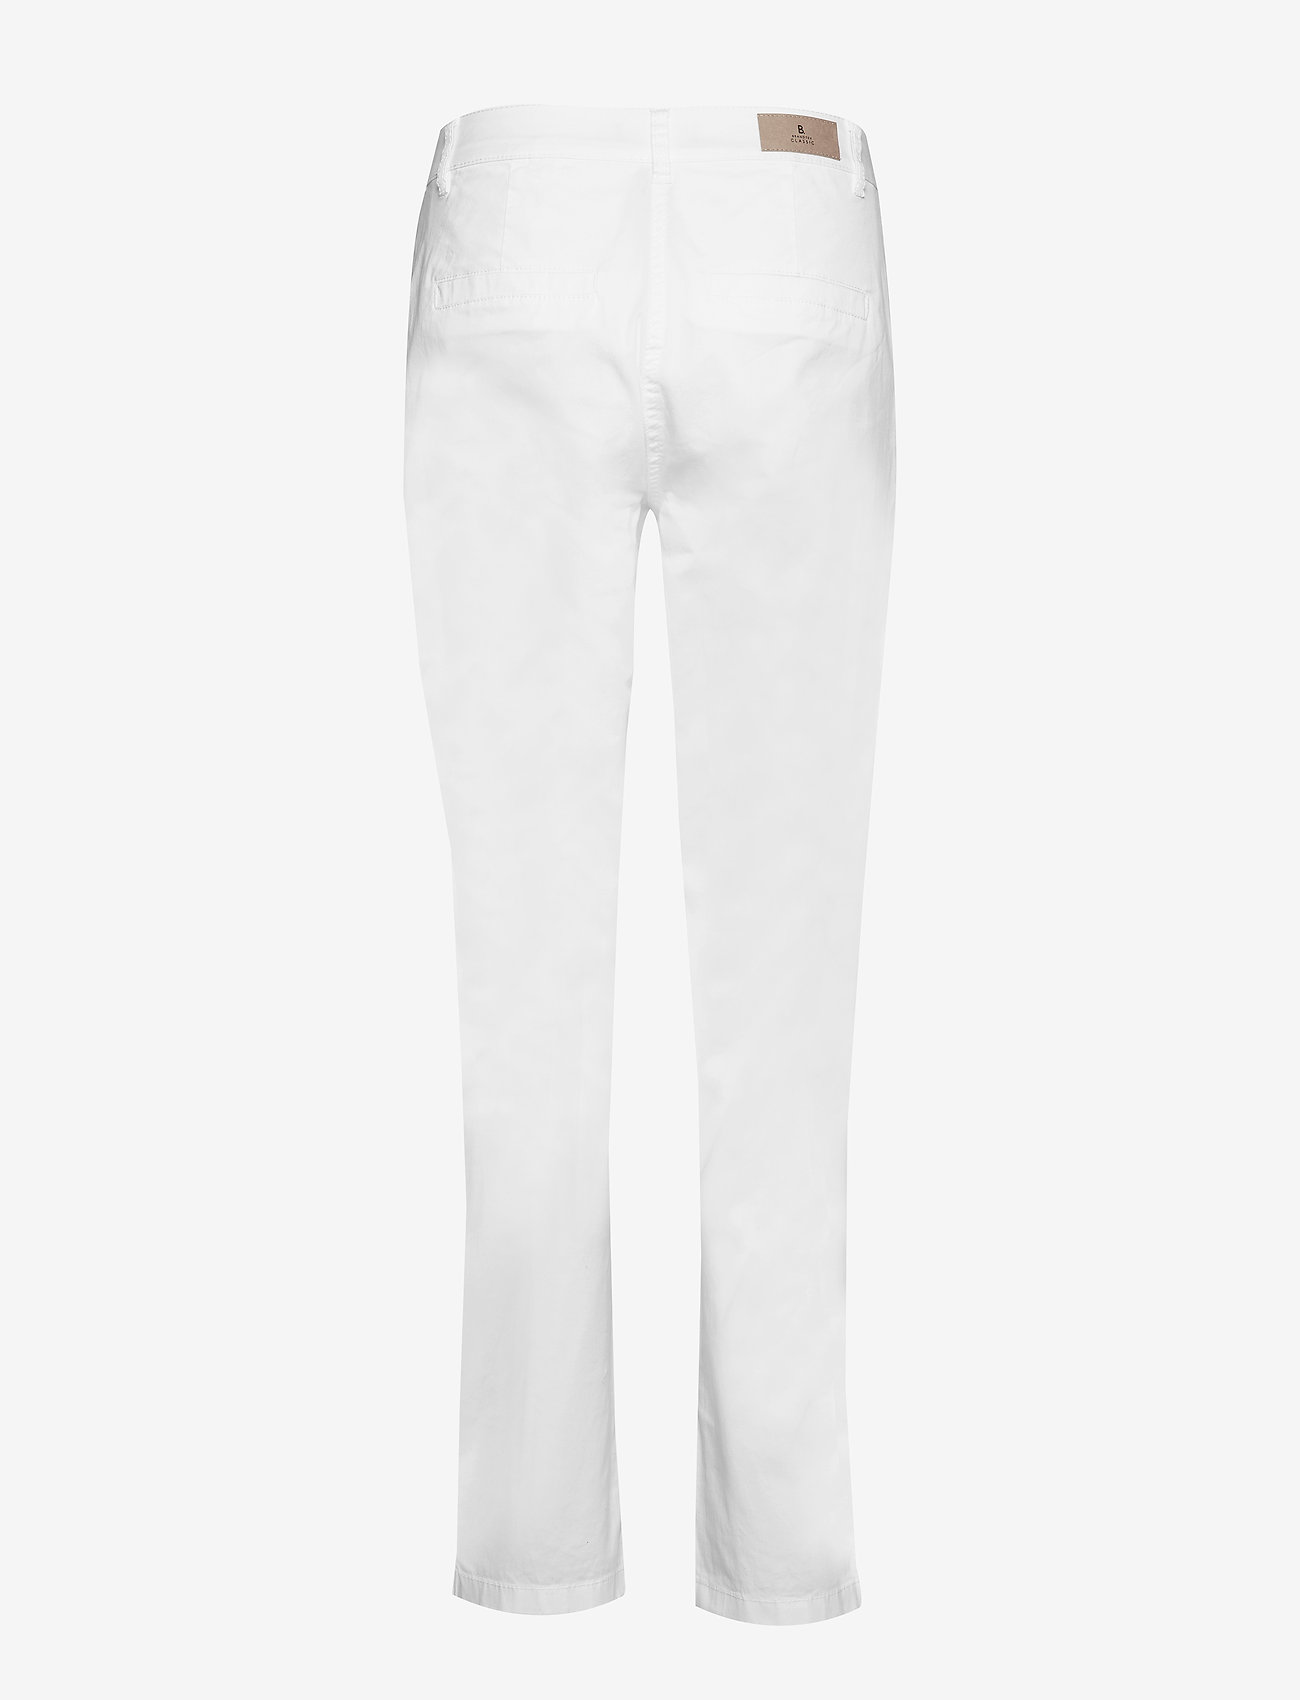 Casual Pants (White) - Brandtex reQXif